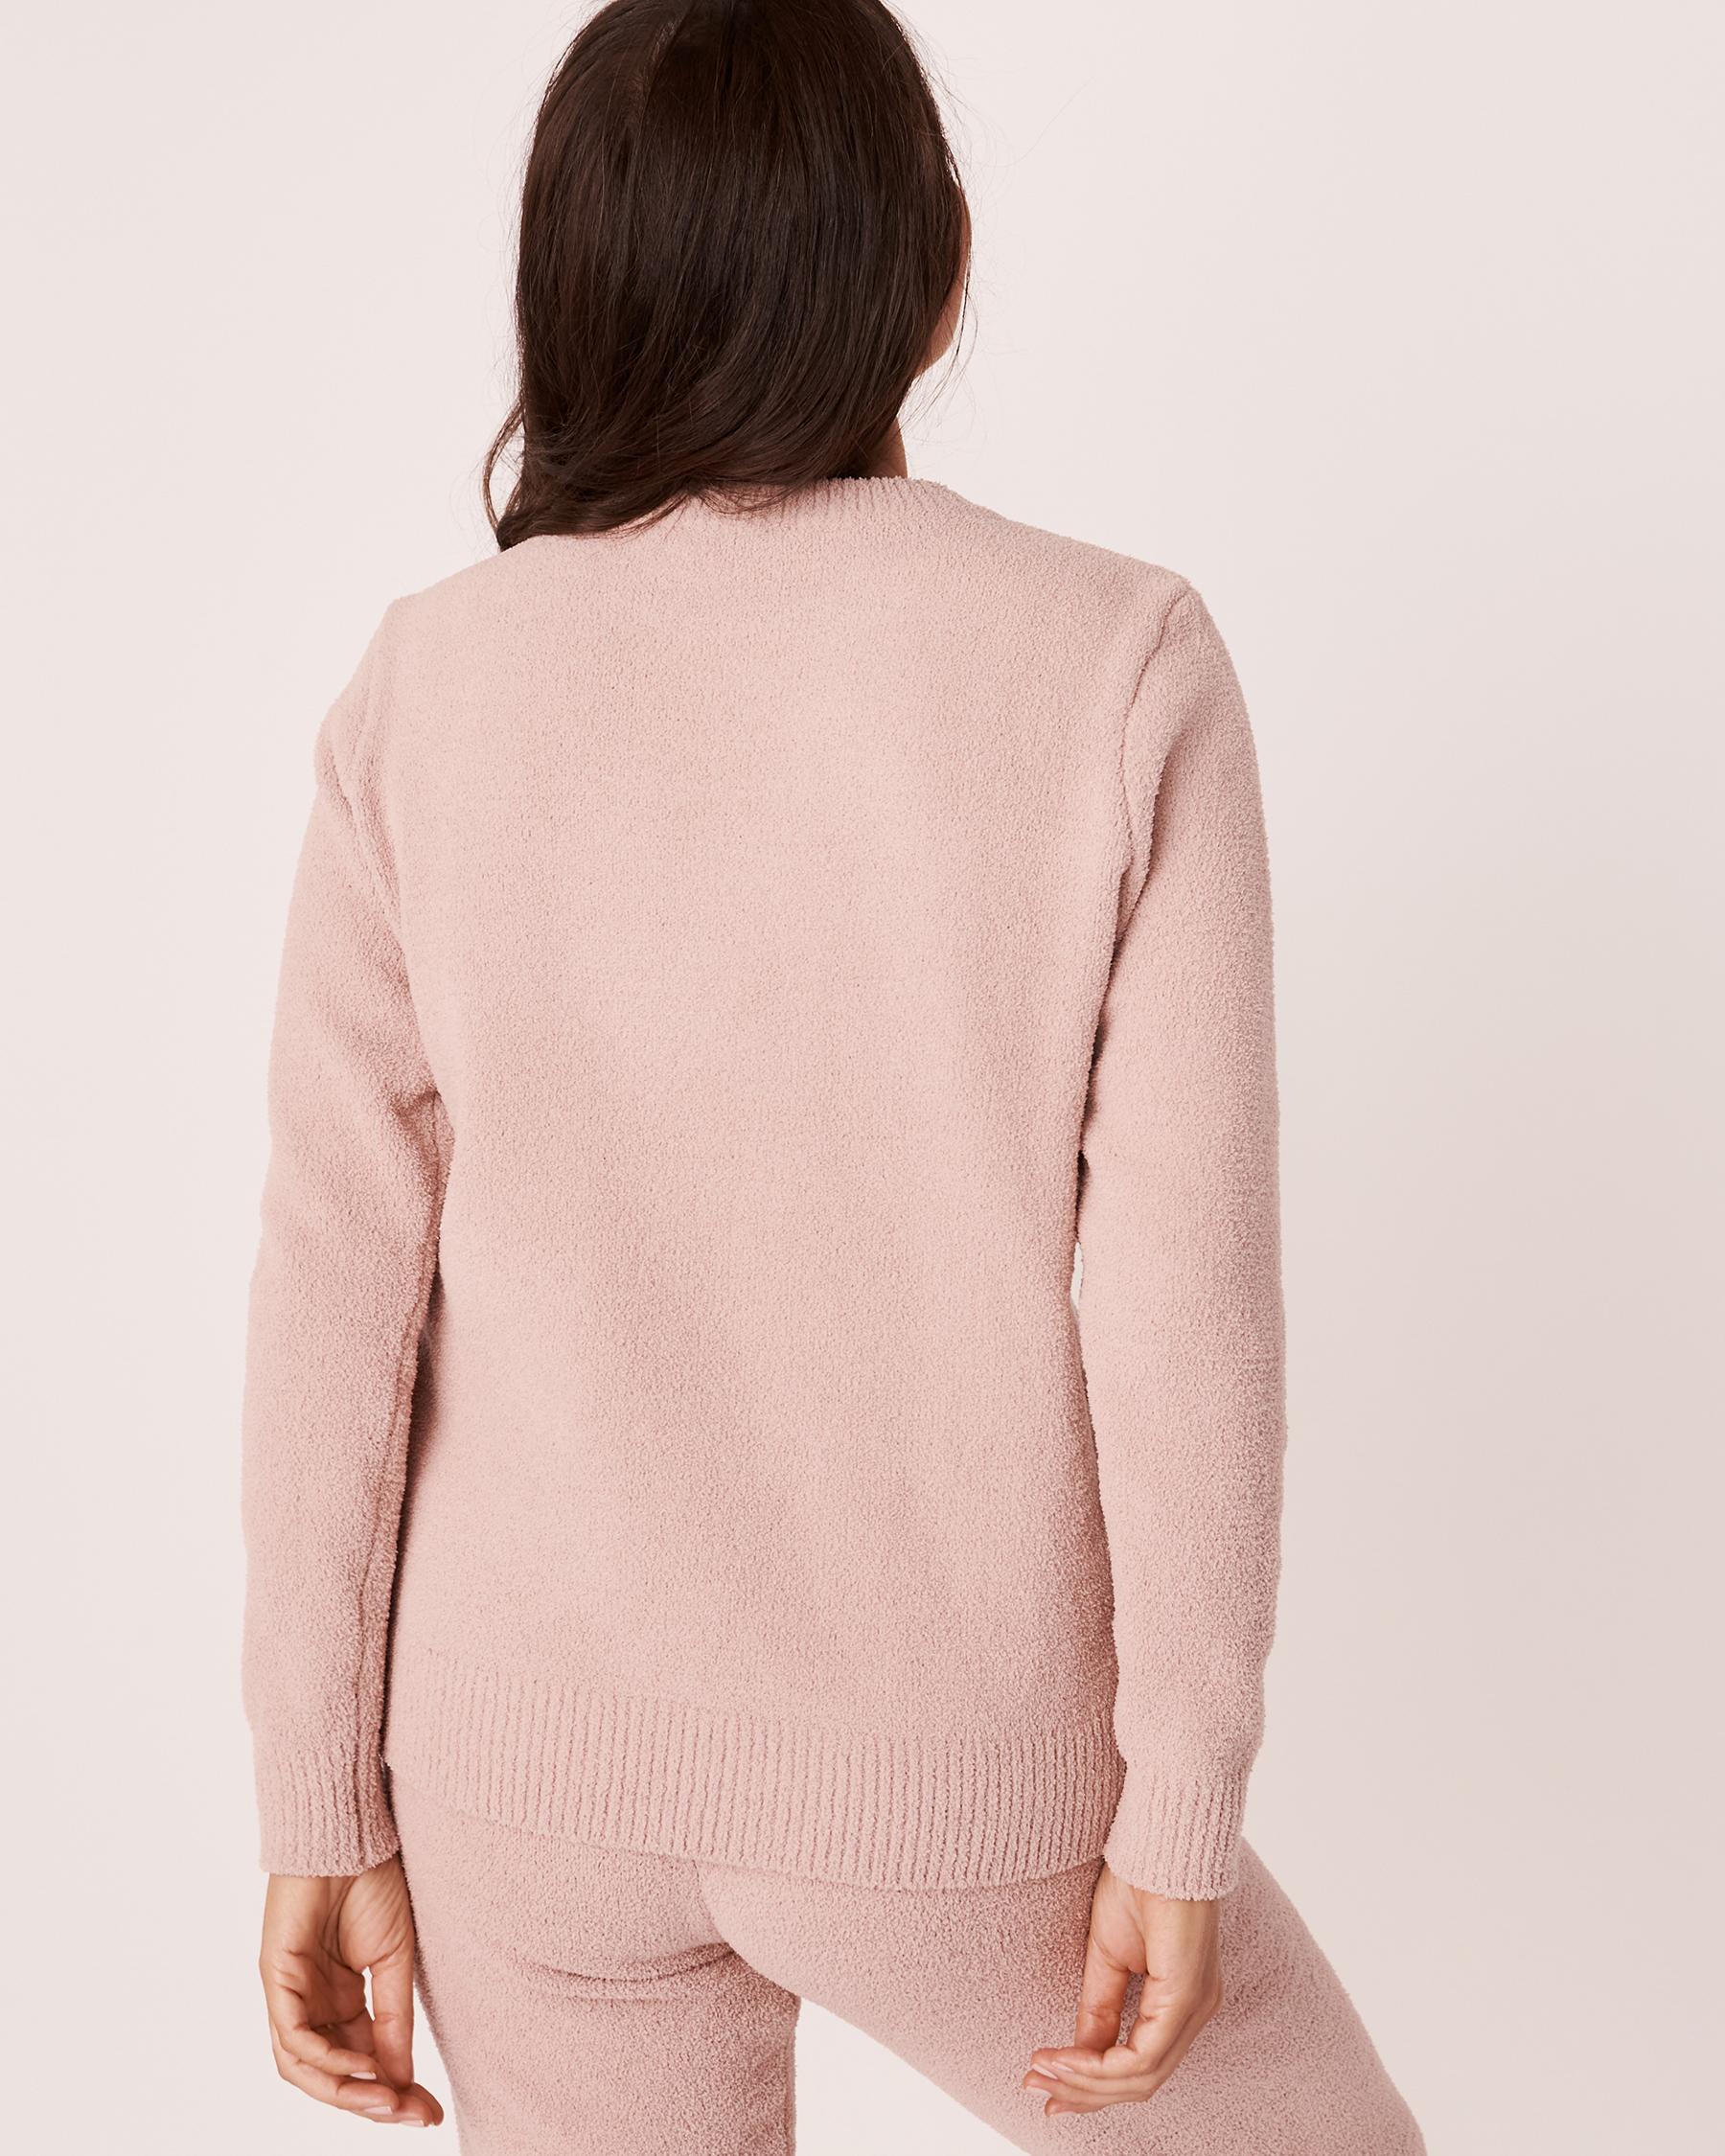 LA VIE EN ROSE Chenille Long Sleeve Shirt Shadow grey 50100019 - View2